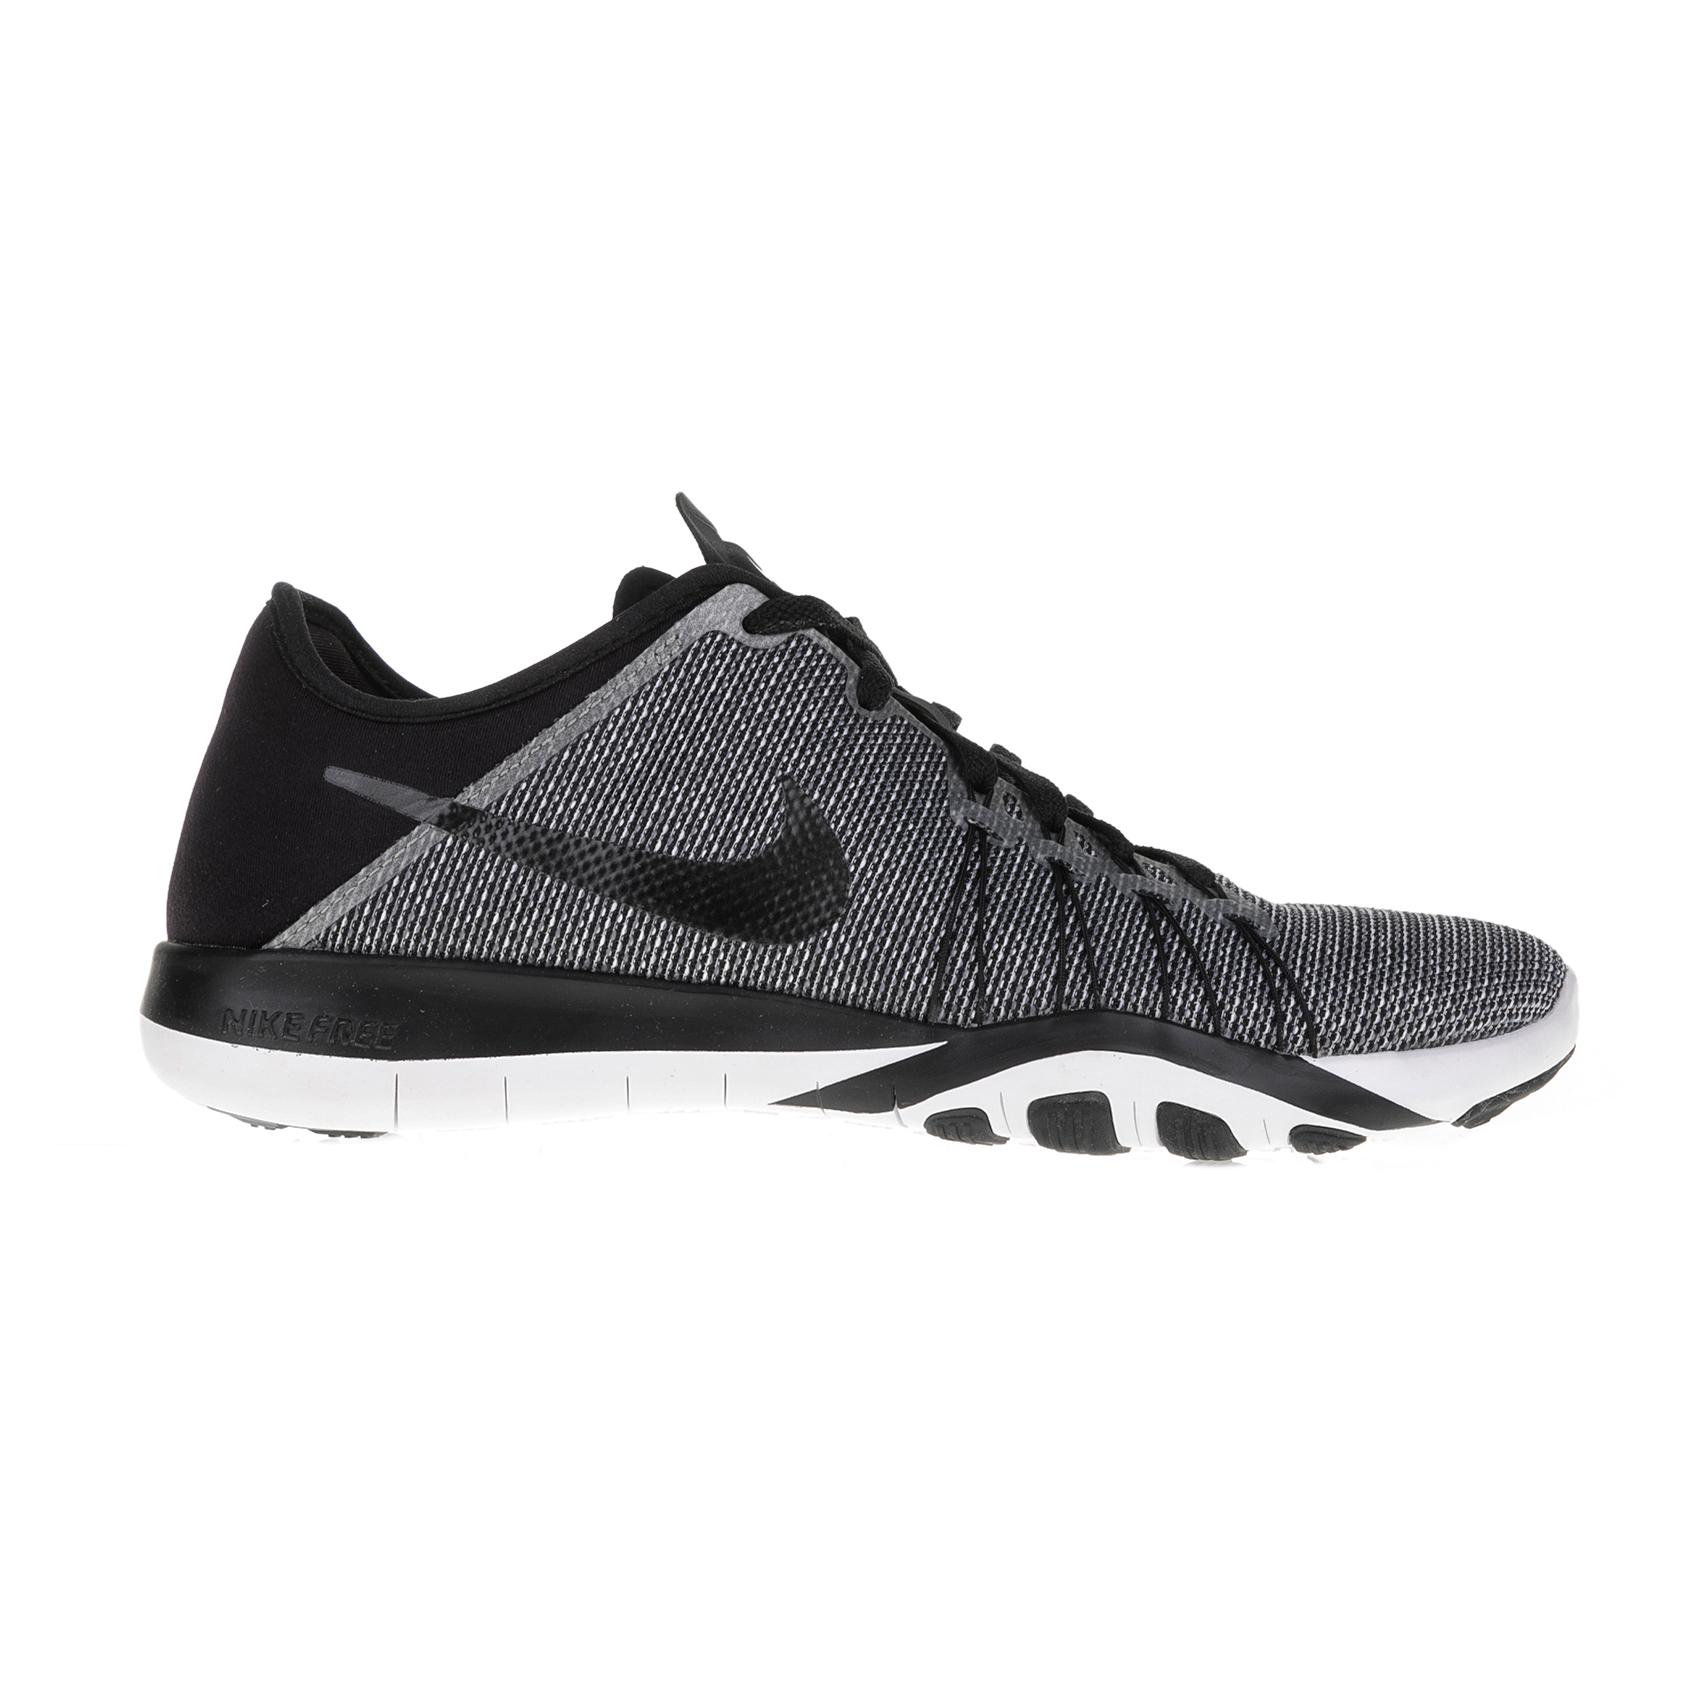 82aca2533a14 NIKE – Γυναικεία αθλητικά παπούτσια Nike FREE TR 6 PRT μαύρα – γκρι